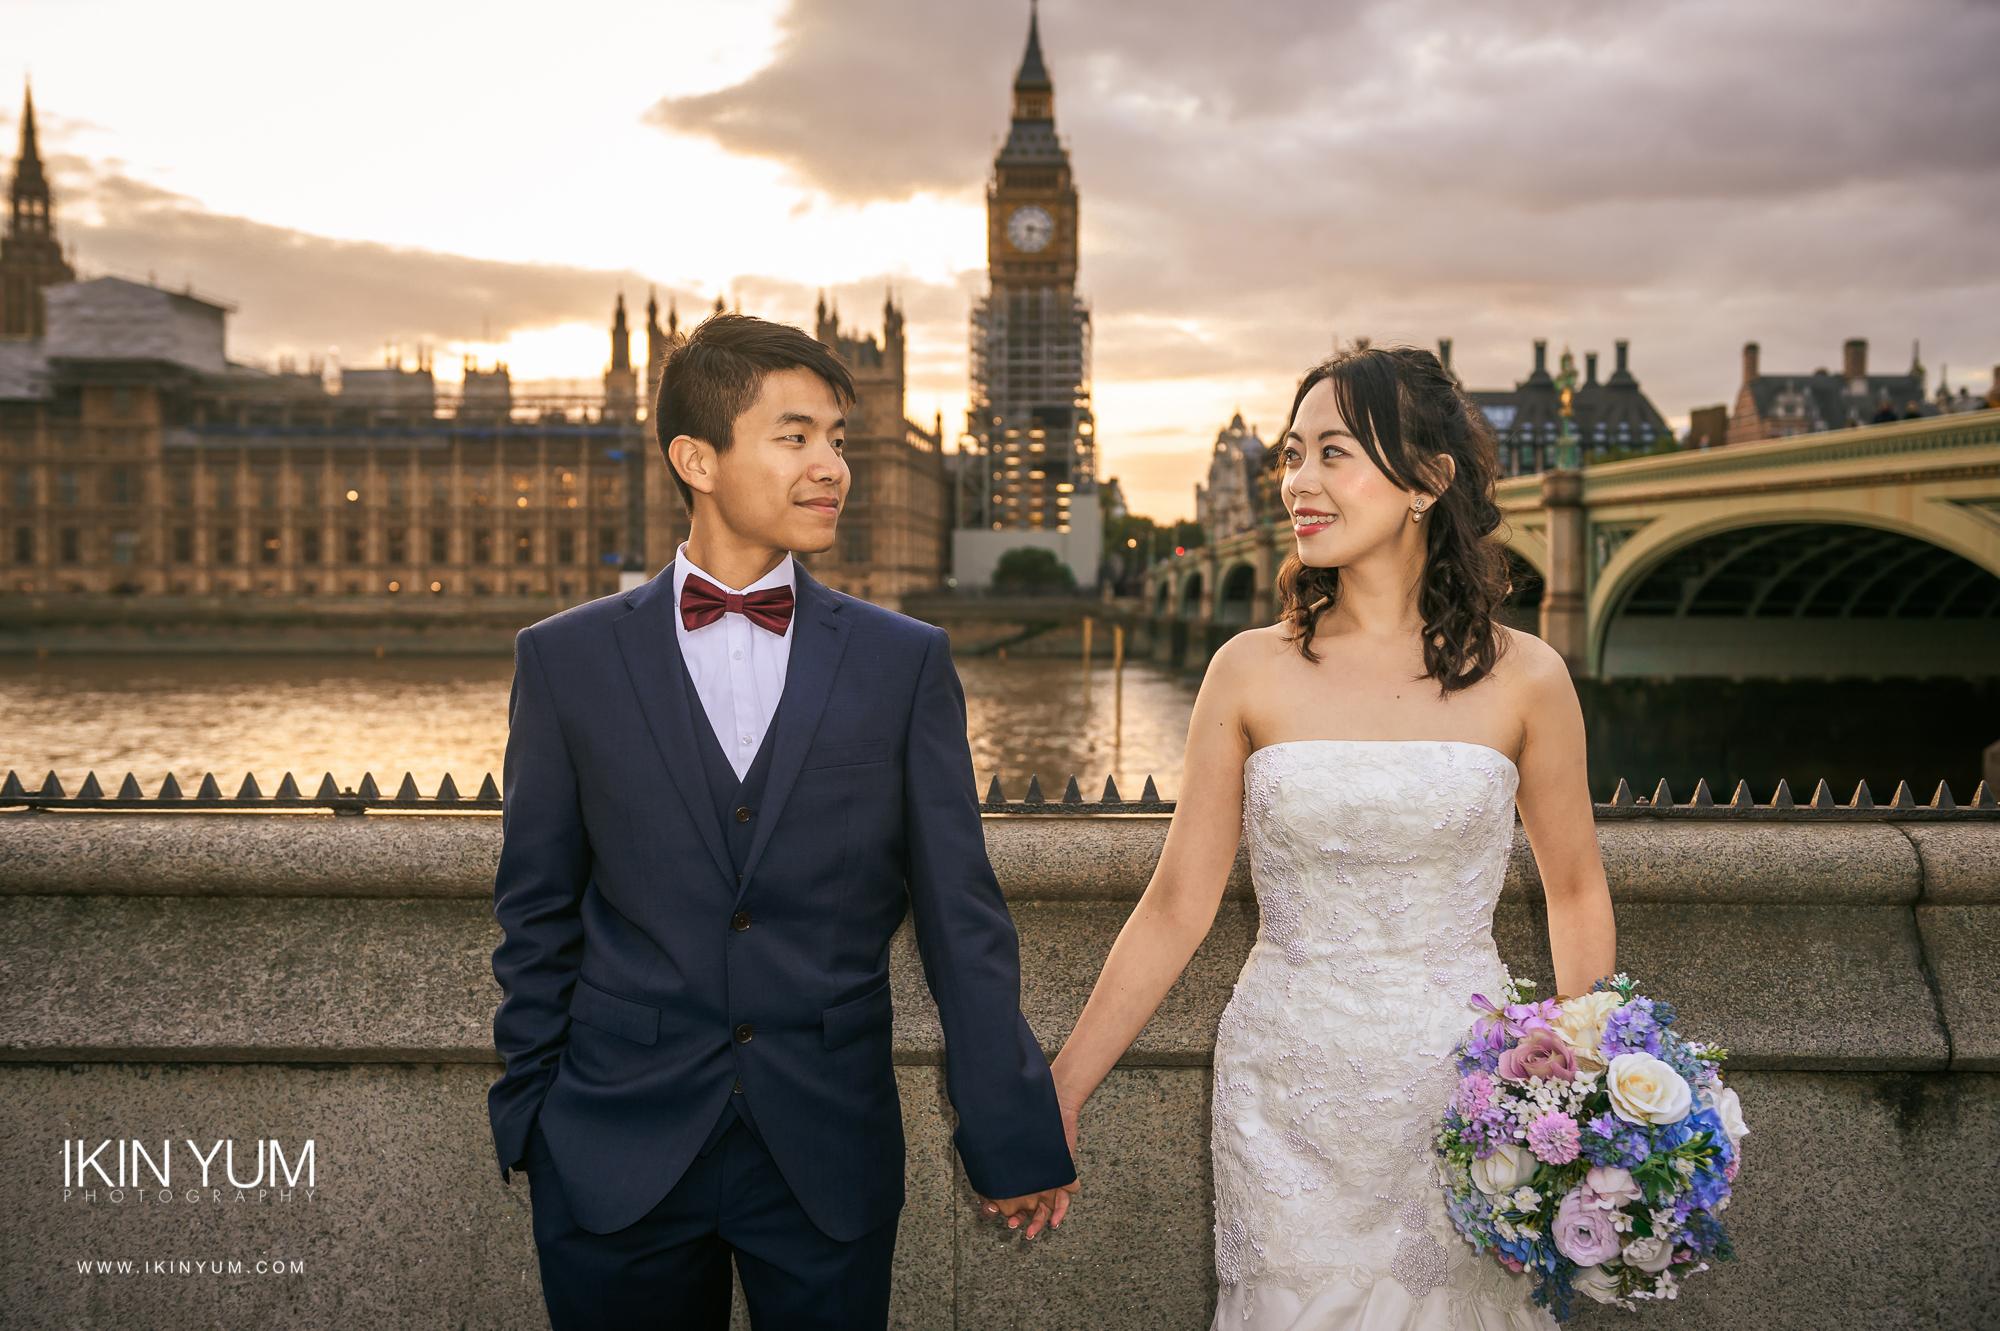 Chloe & Carlos Pre-Wedding Shoot- Ikin Yum Photography-0127.jpg